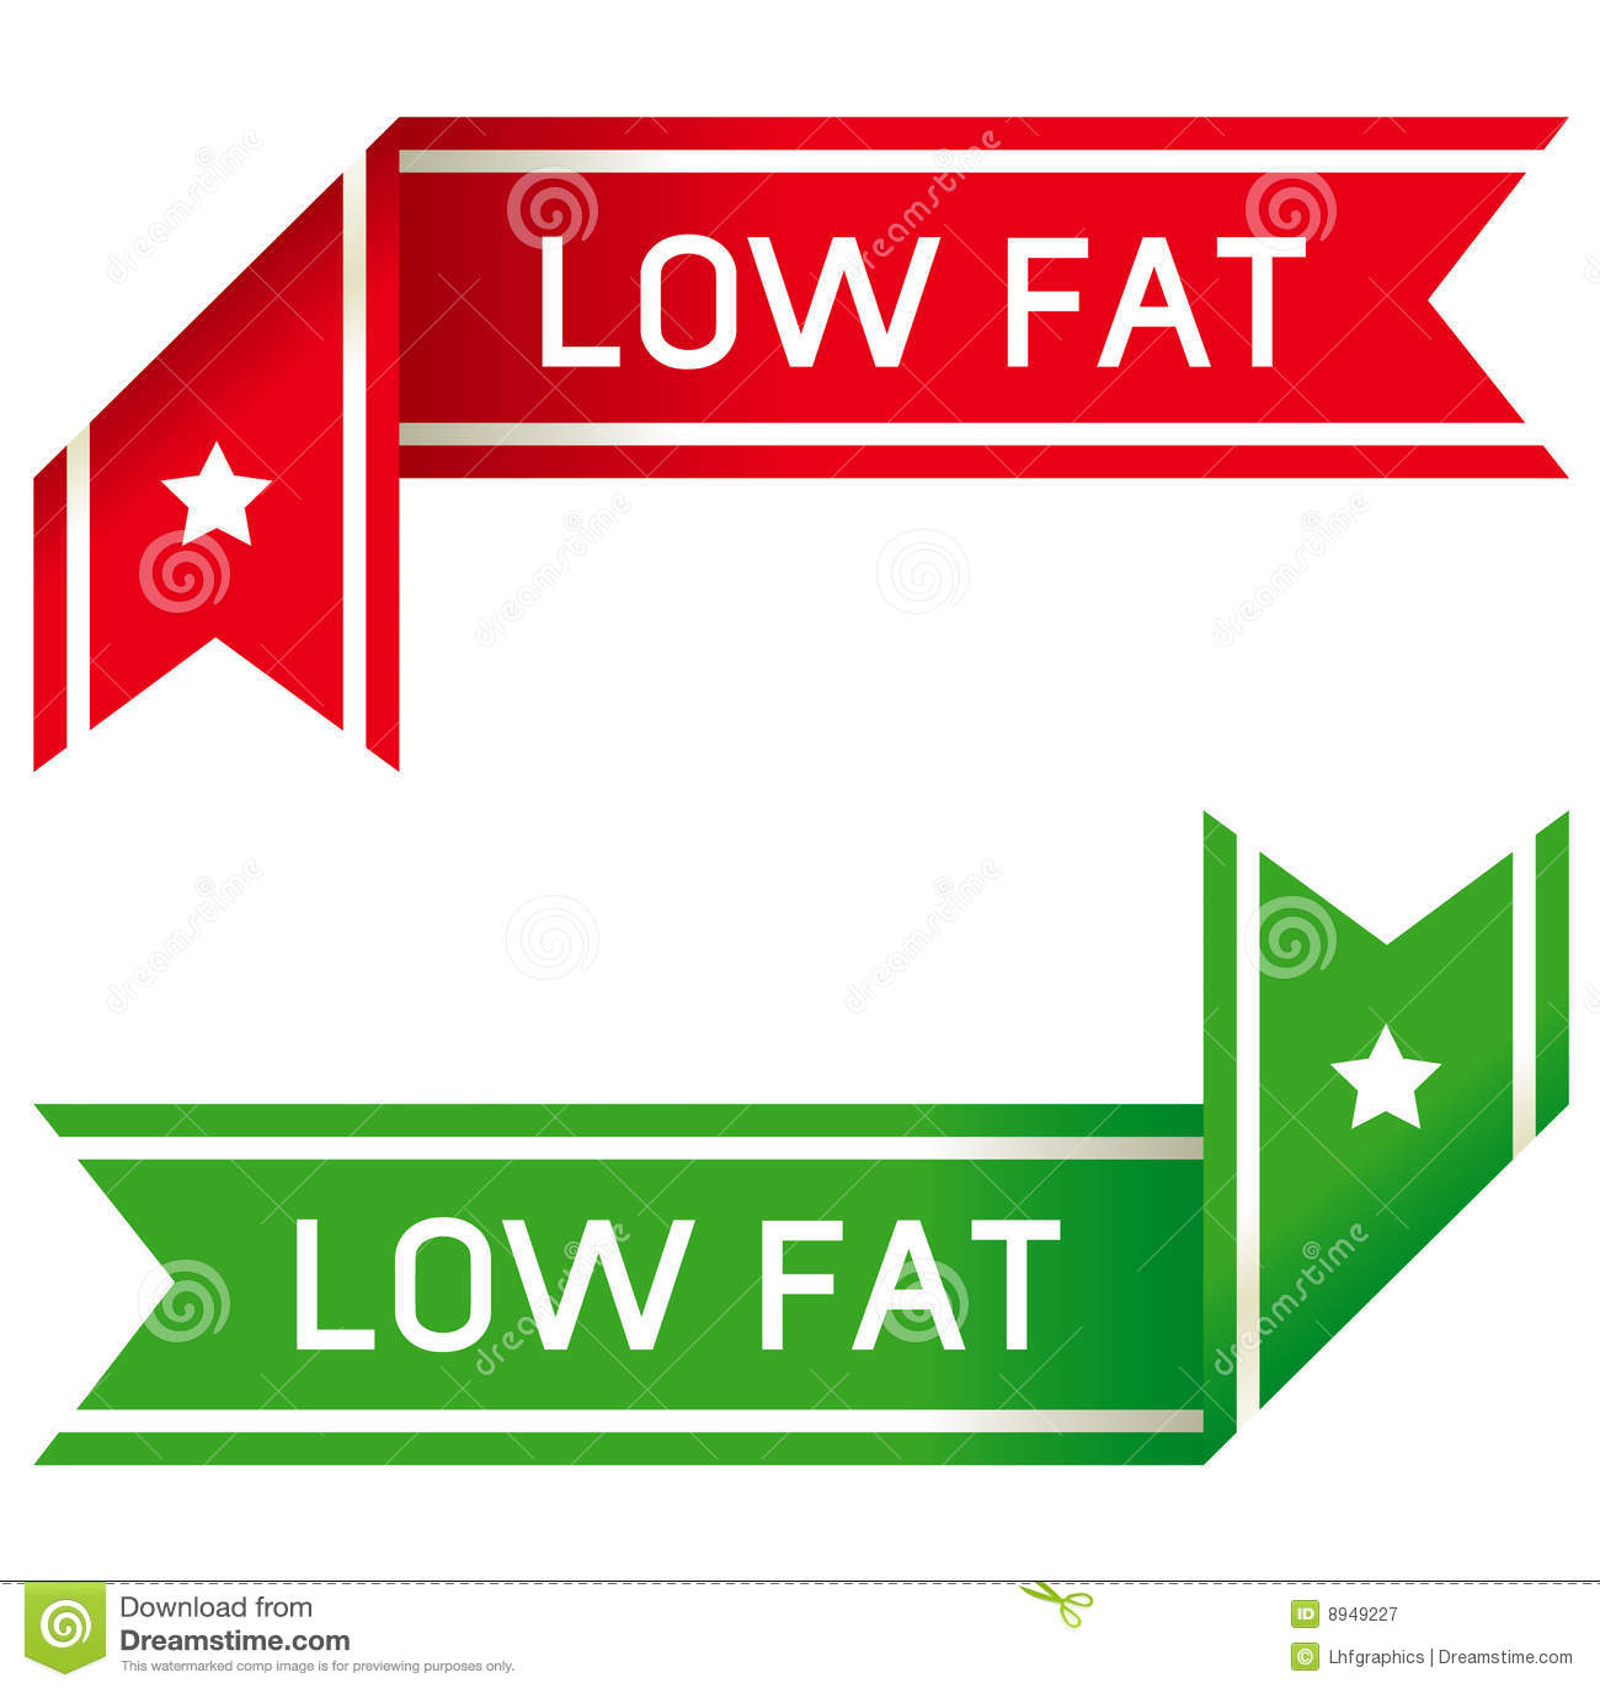 Low fat food label definition